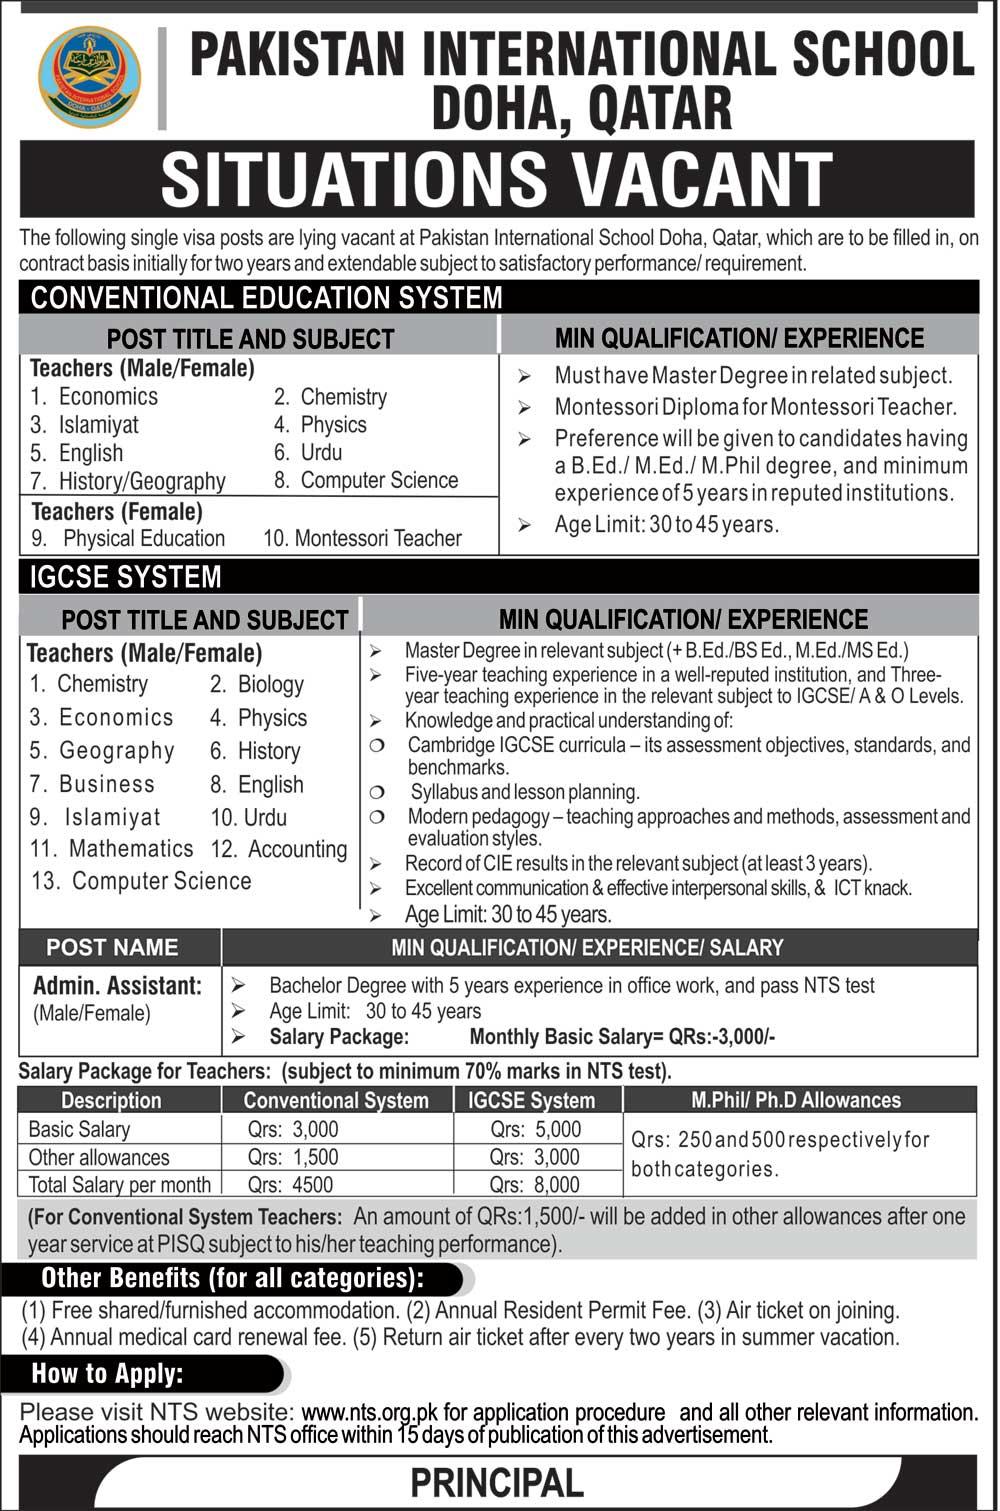 Pakistan International School Doha Qatar NTS Jobs 2019 Application Form Download